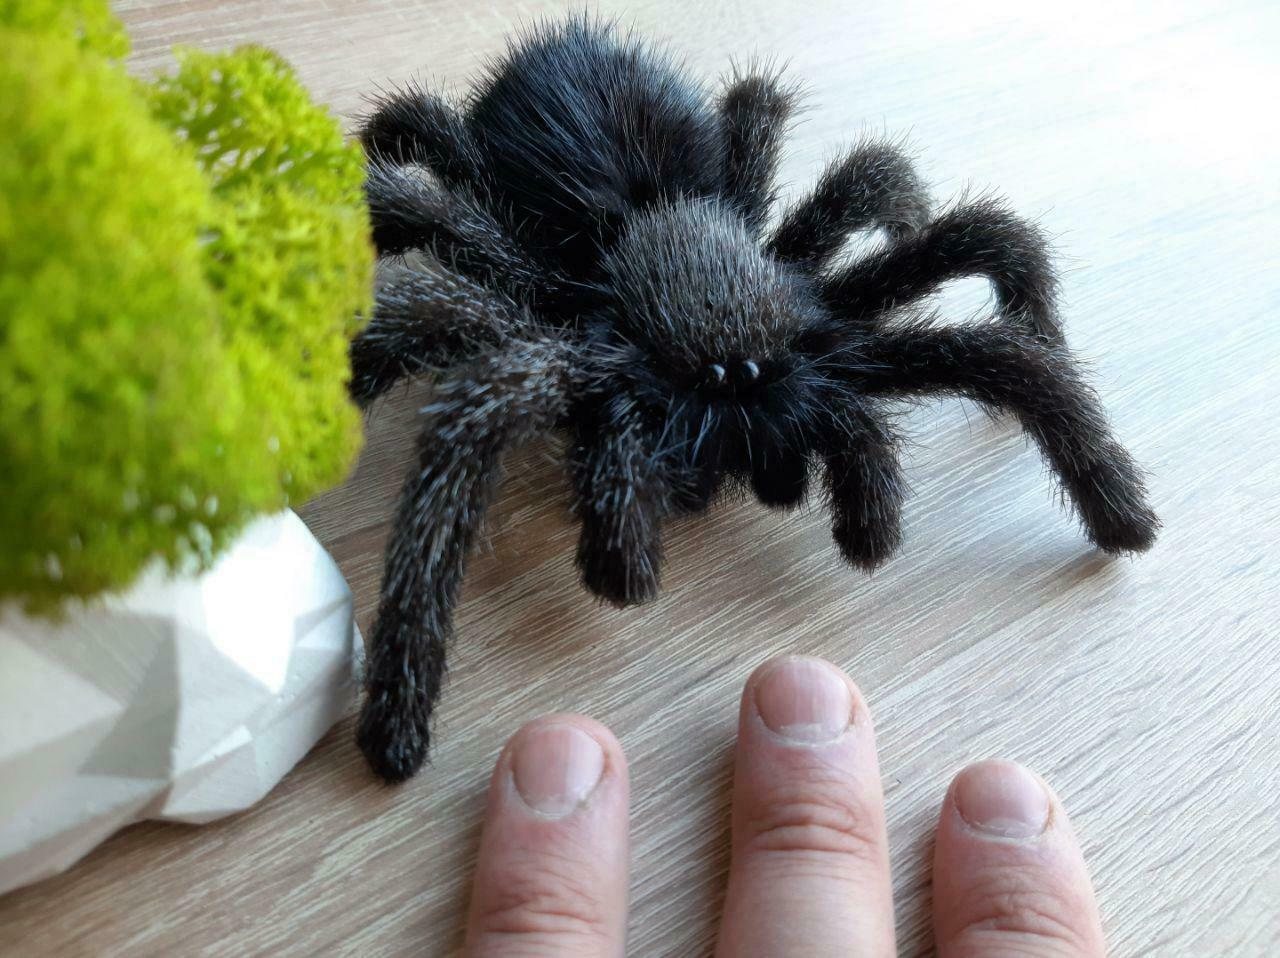 Tarantula Stuffed Animal, Plush Animal Stuffed Toy Hansa Grasshopper Realistic Crafted Handmade 6569 For Sale Online Ebay